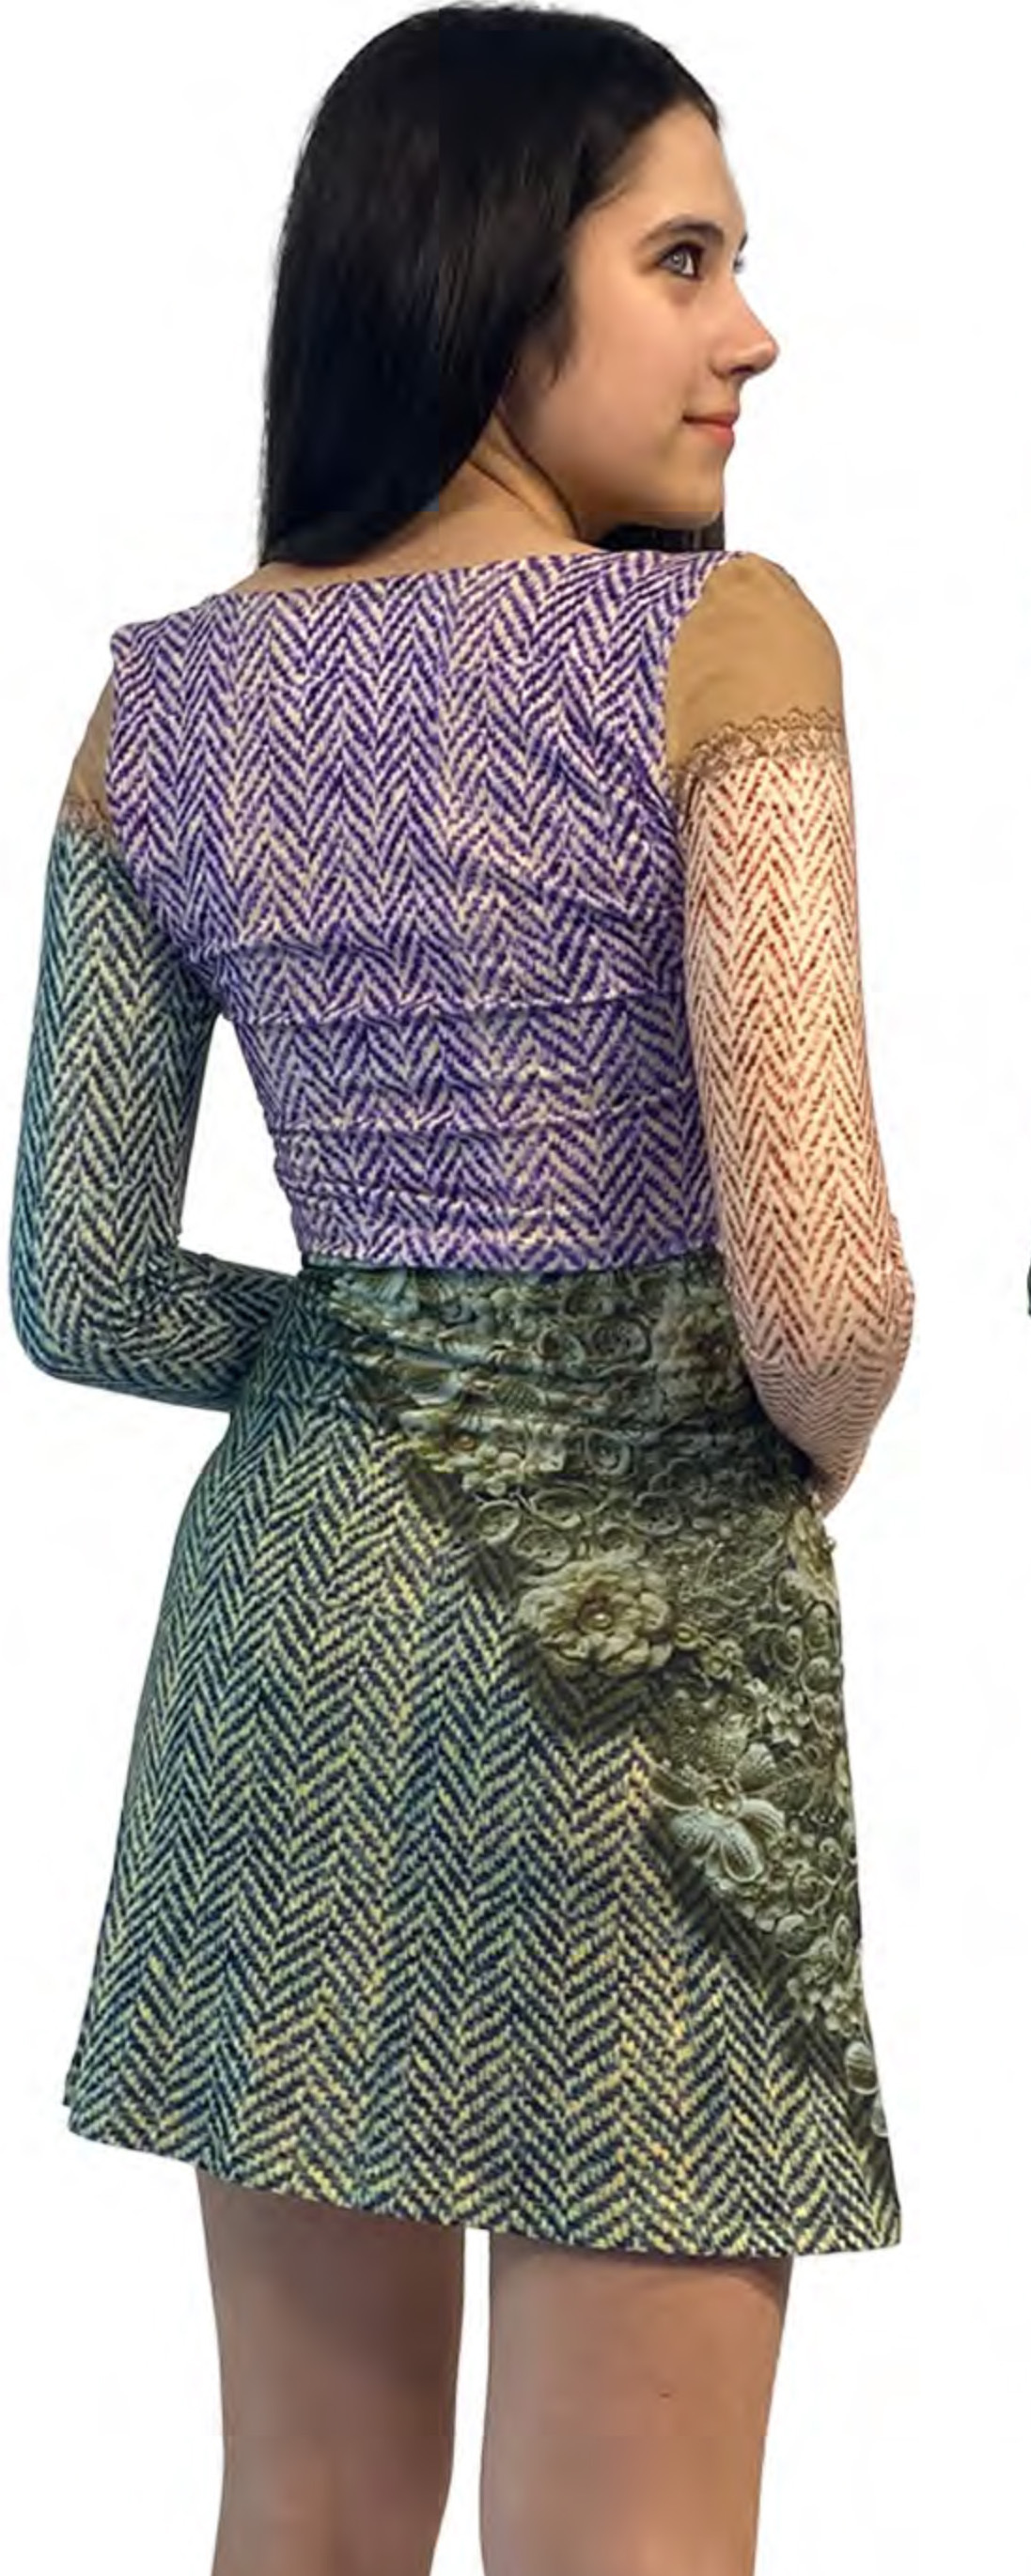 IPNG: Mood Of Flavour Tweed Illusion Flared Mini Skirt